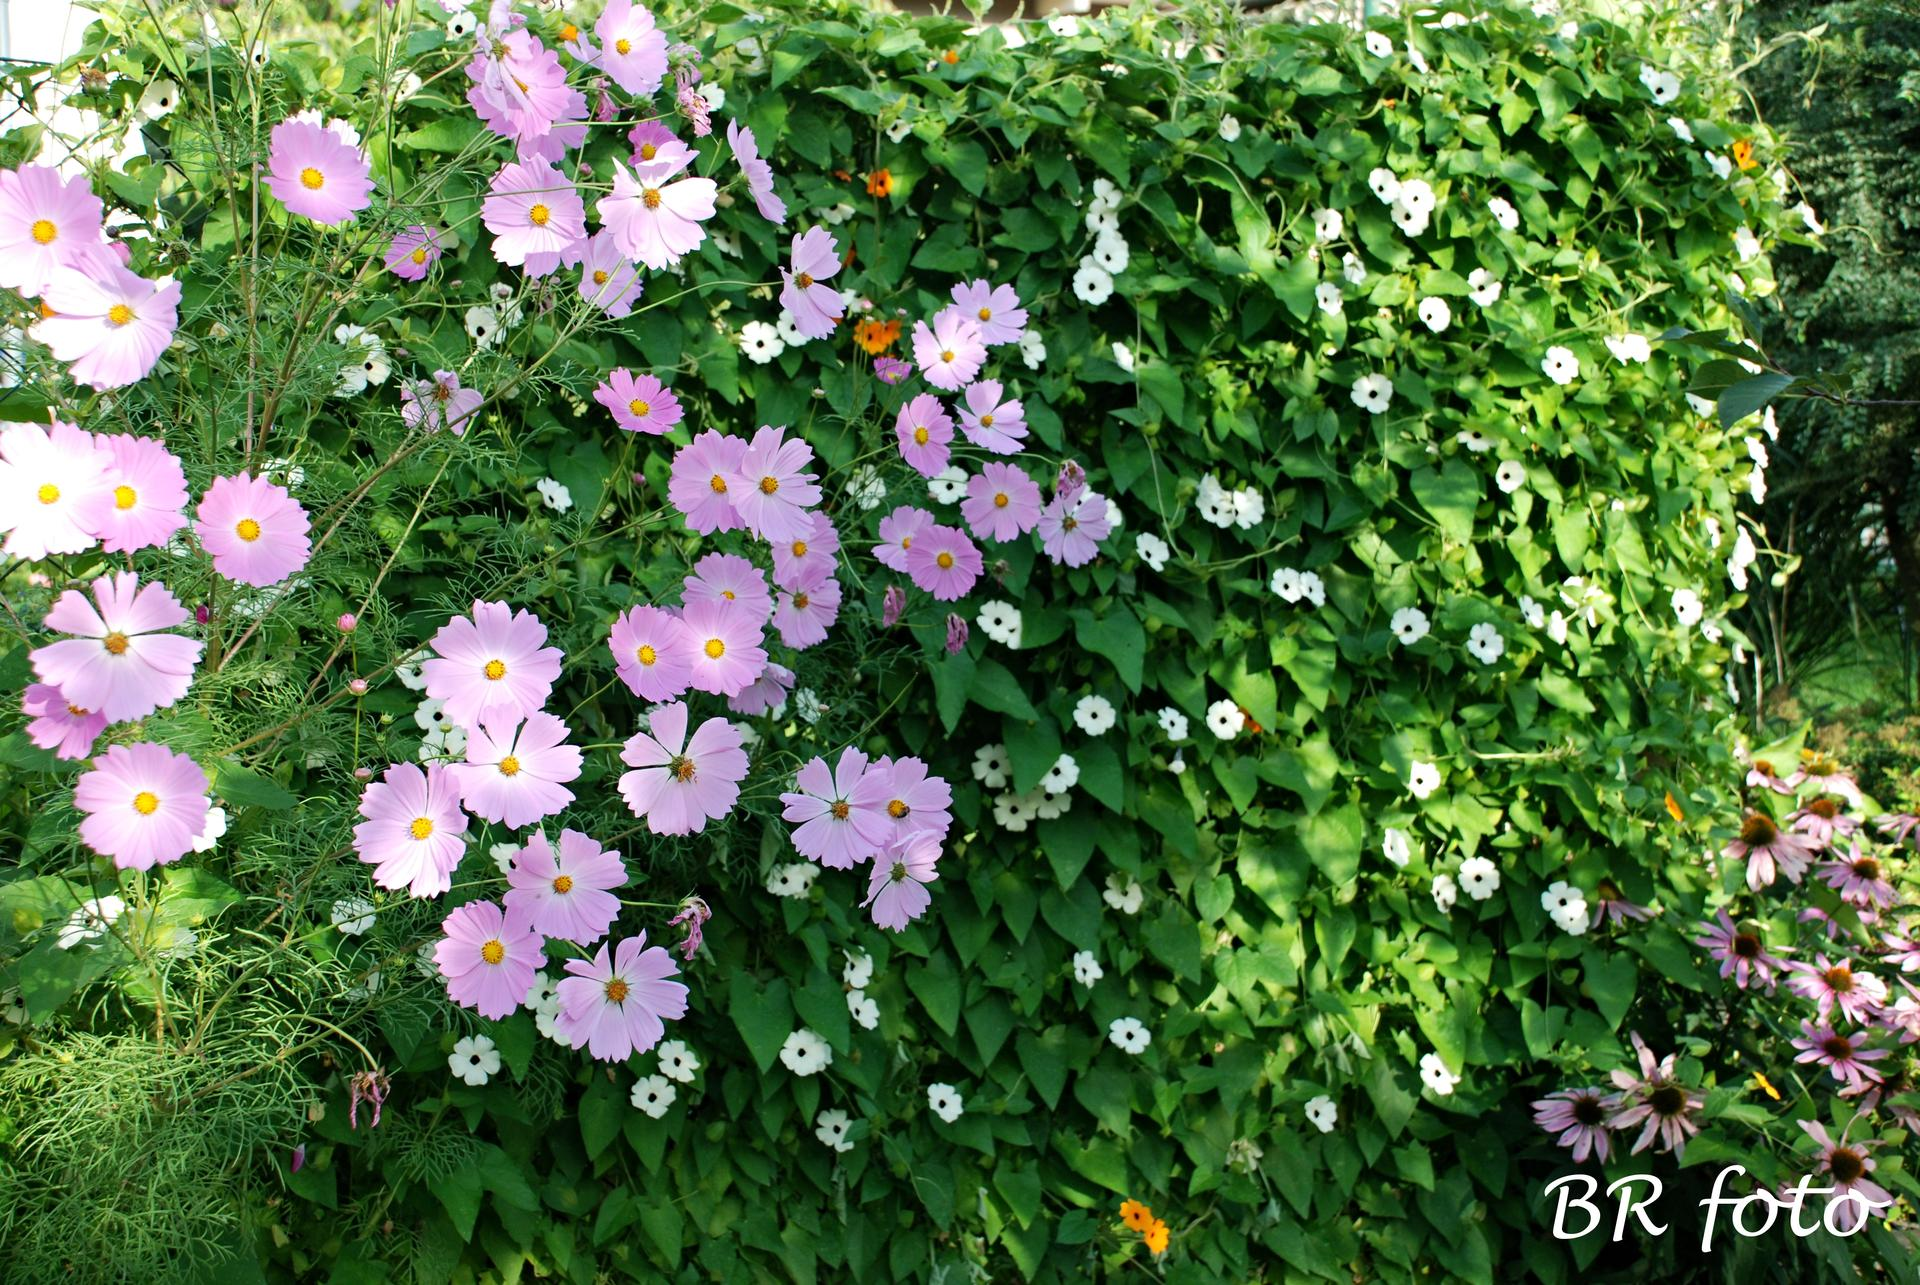 Zahrada v létě - krásenka a smatavka /černooká zuzana/